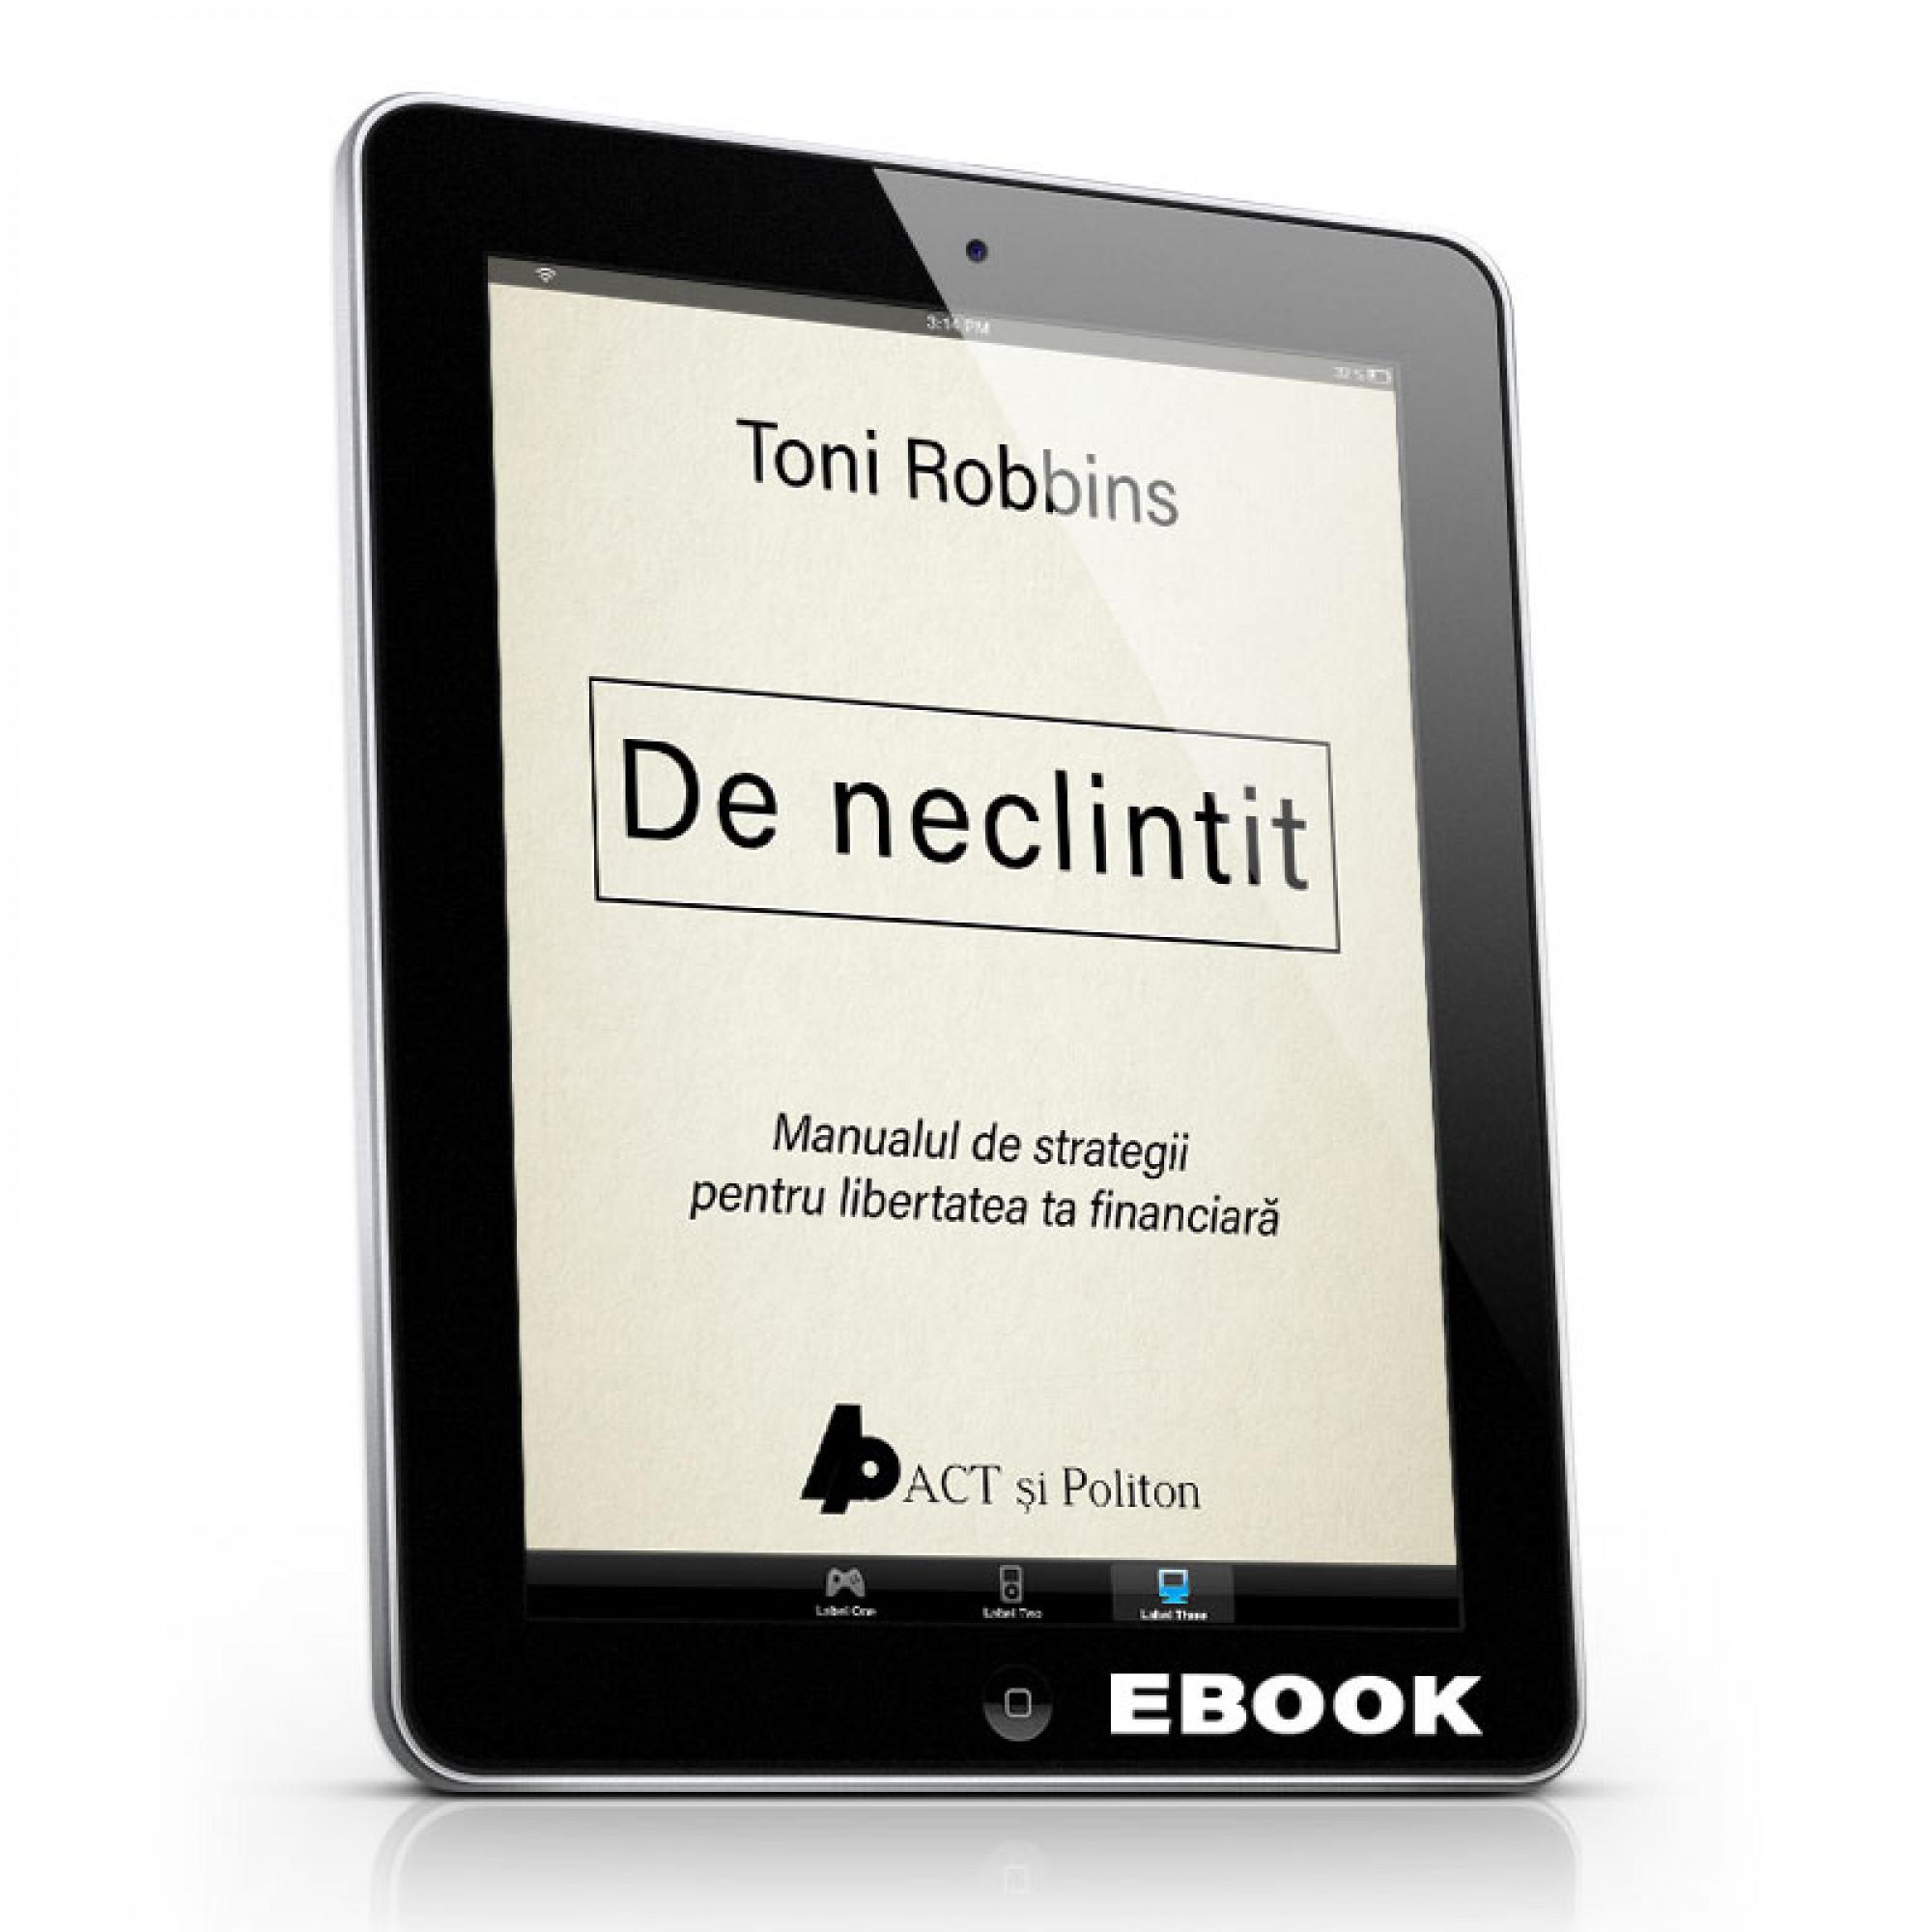 De neclintit; Tony Robbins